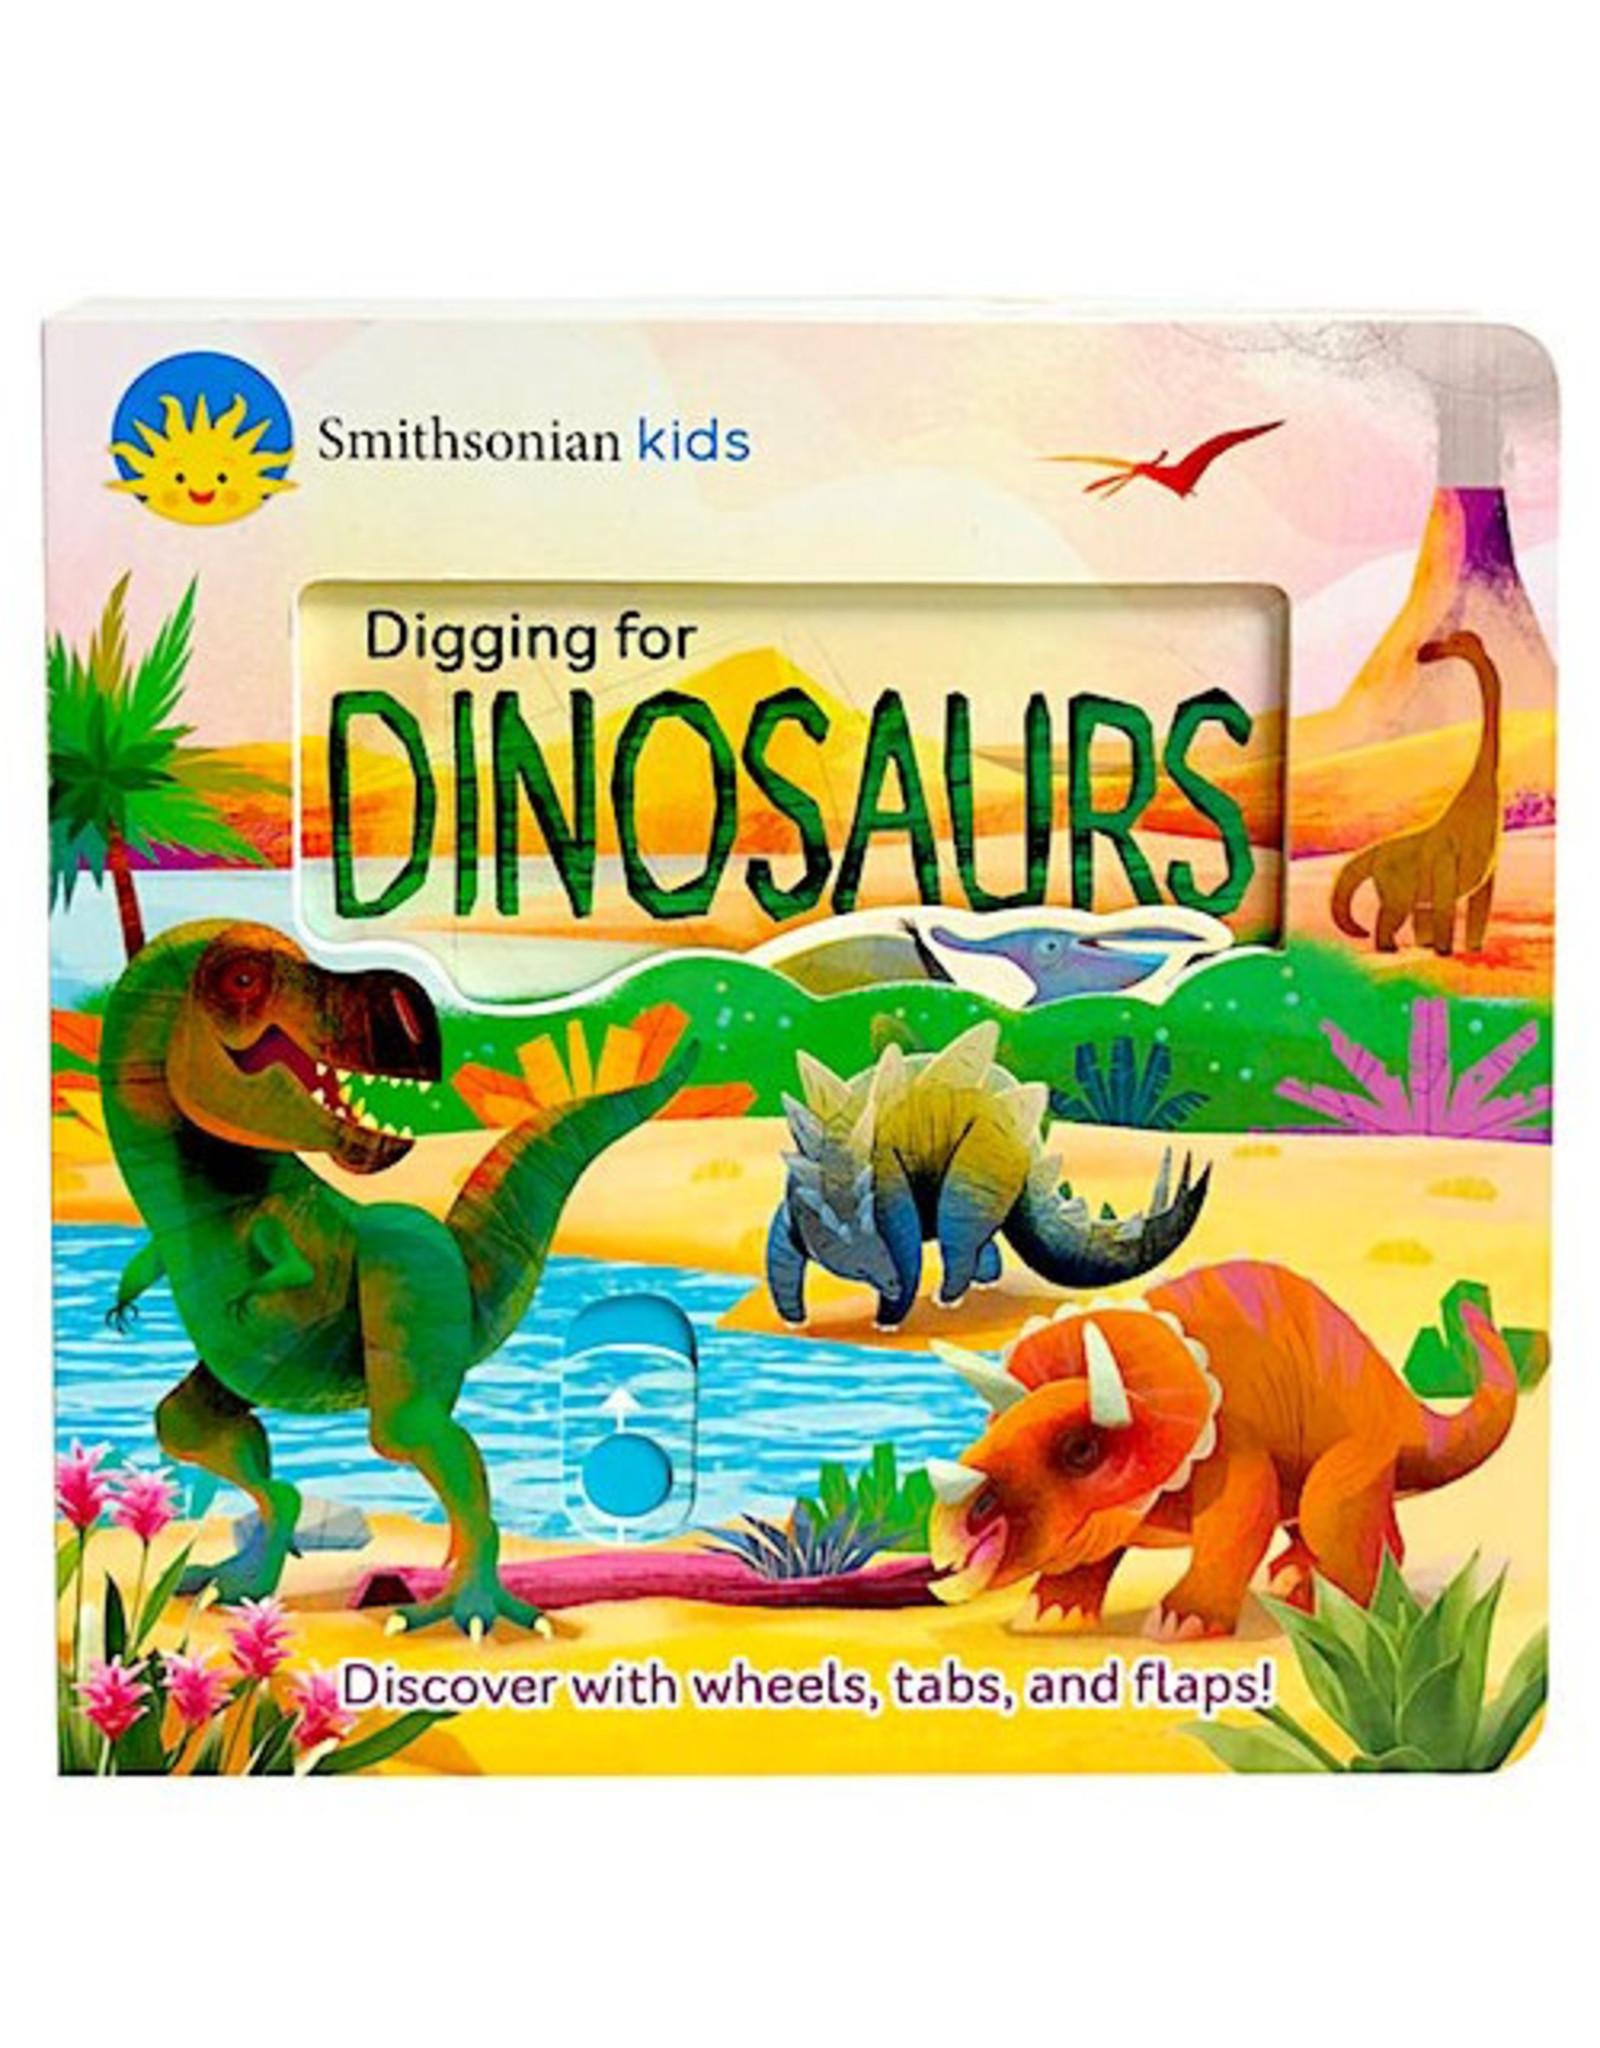 Cottage Door Press Digging for Dinosaurs